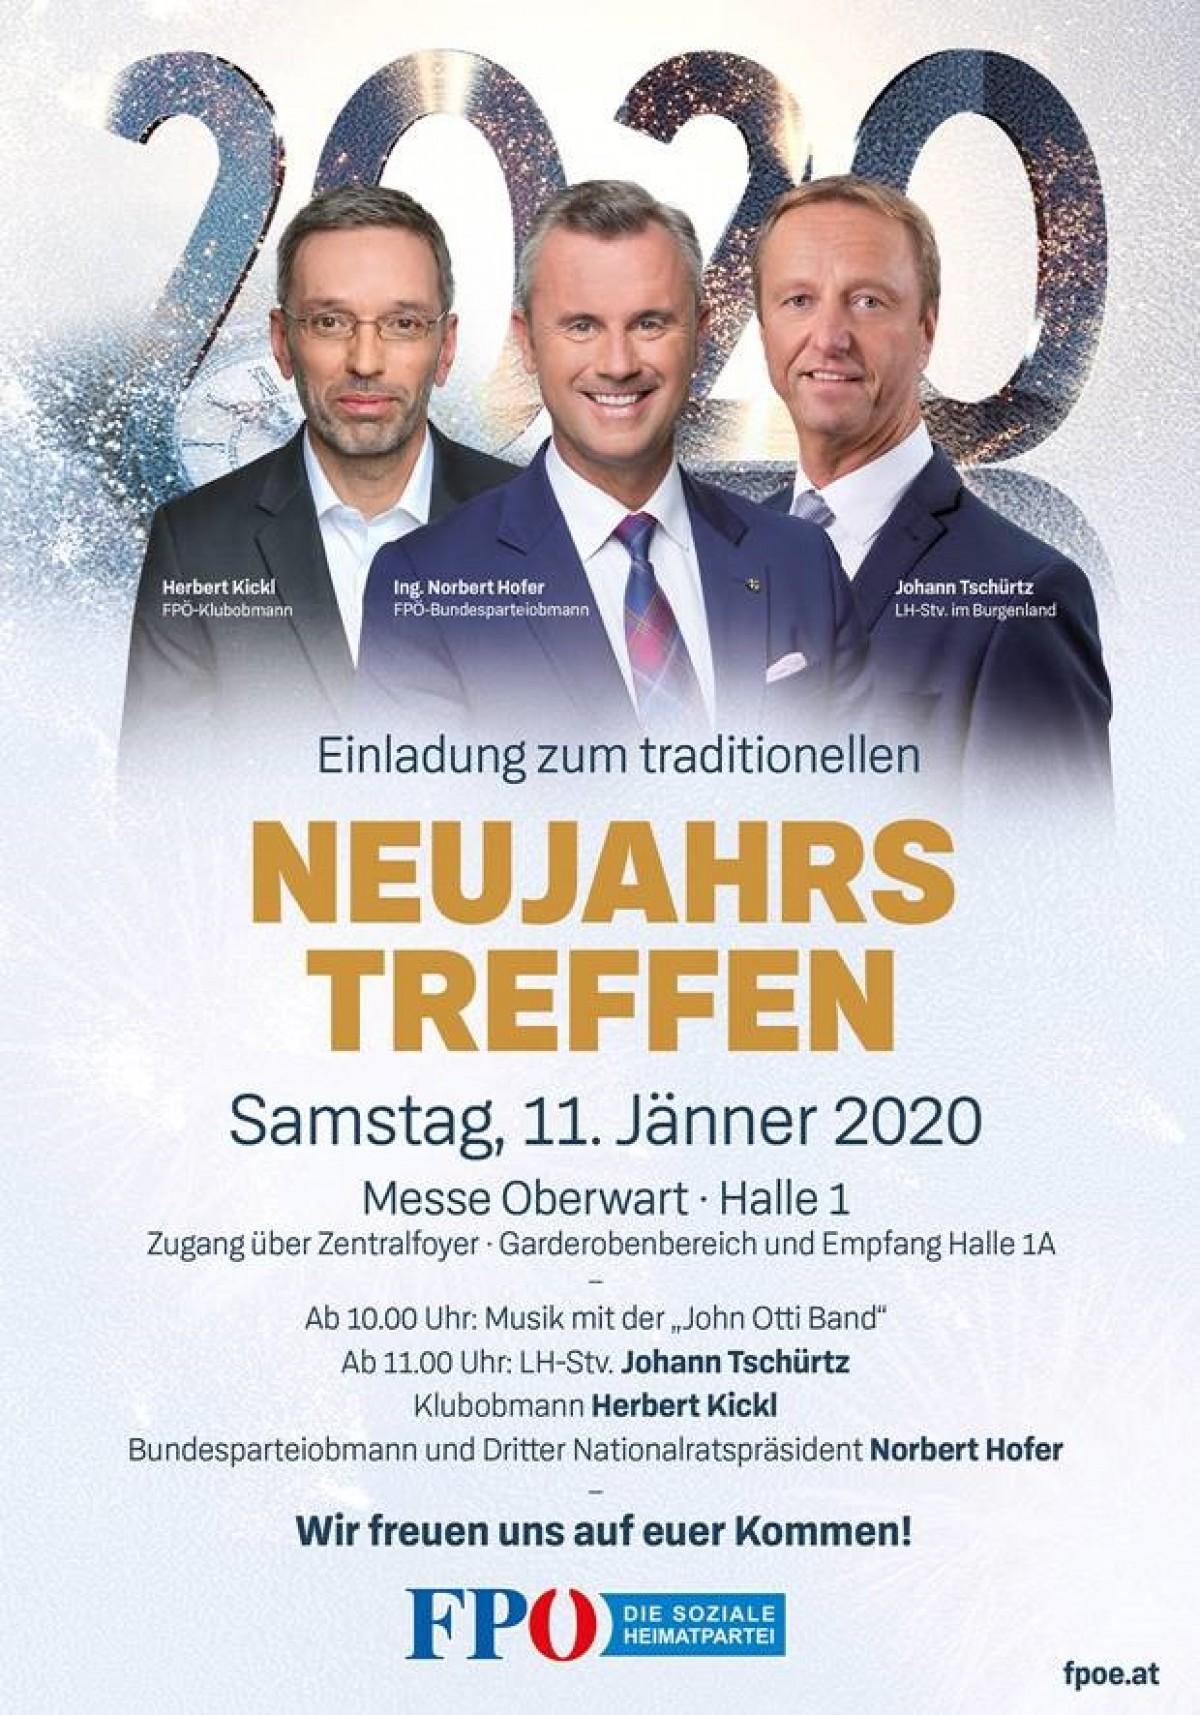 Talentetausch-Treffen in Oberwart - omr-software.com